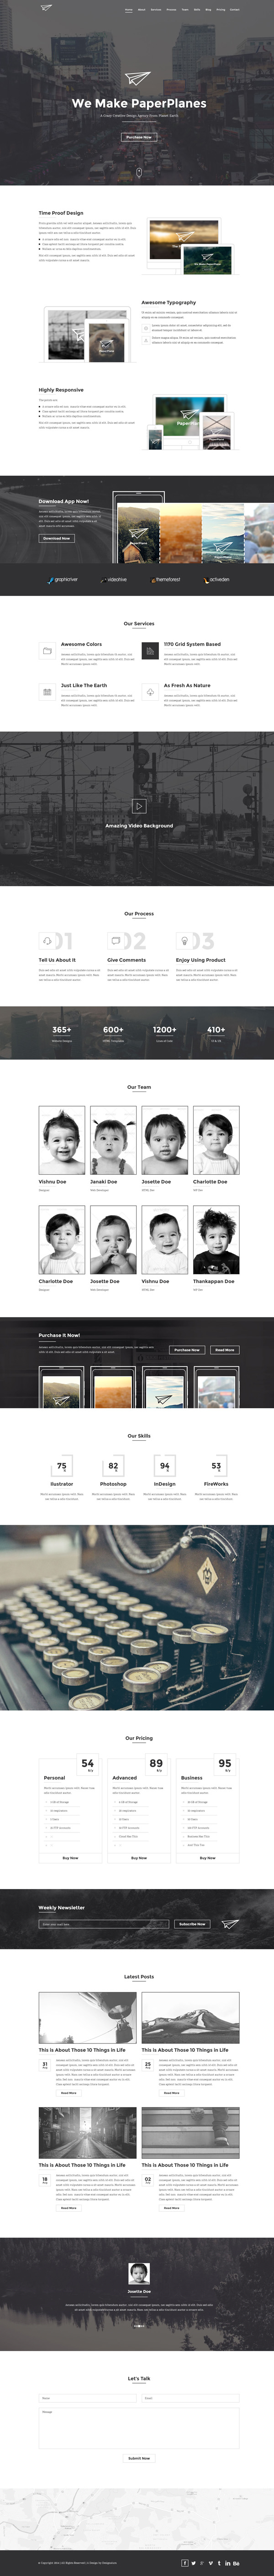 PaperPlane - HTML5 Portfolio Template